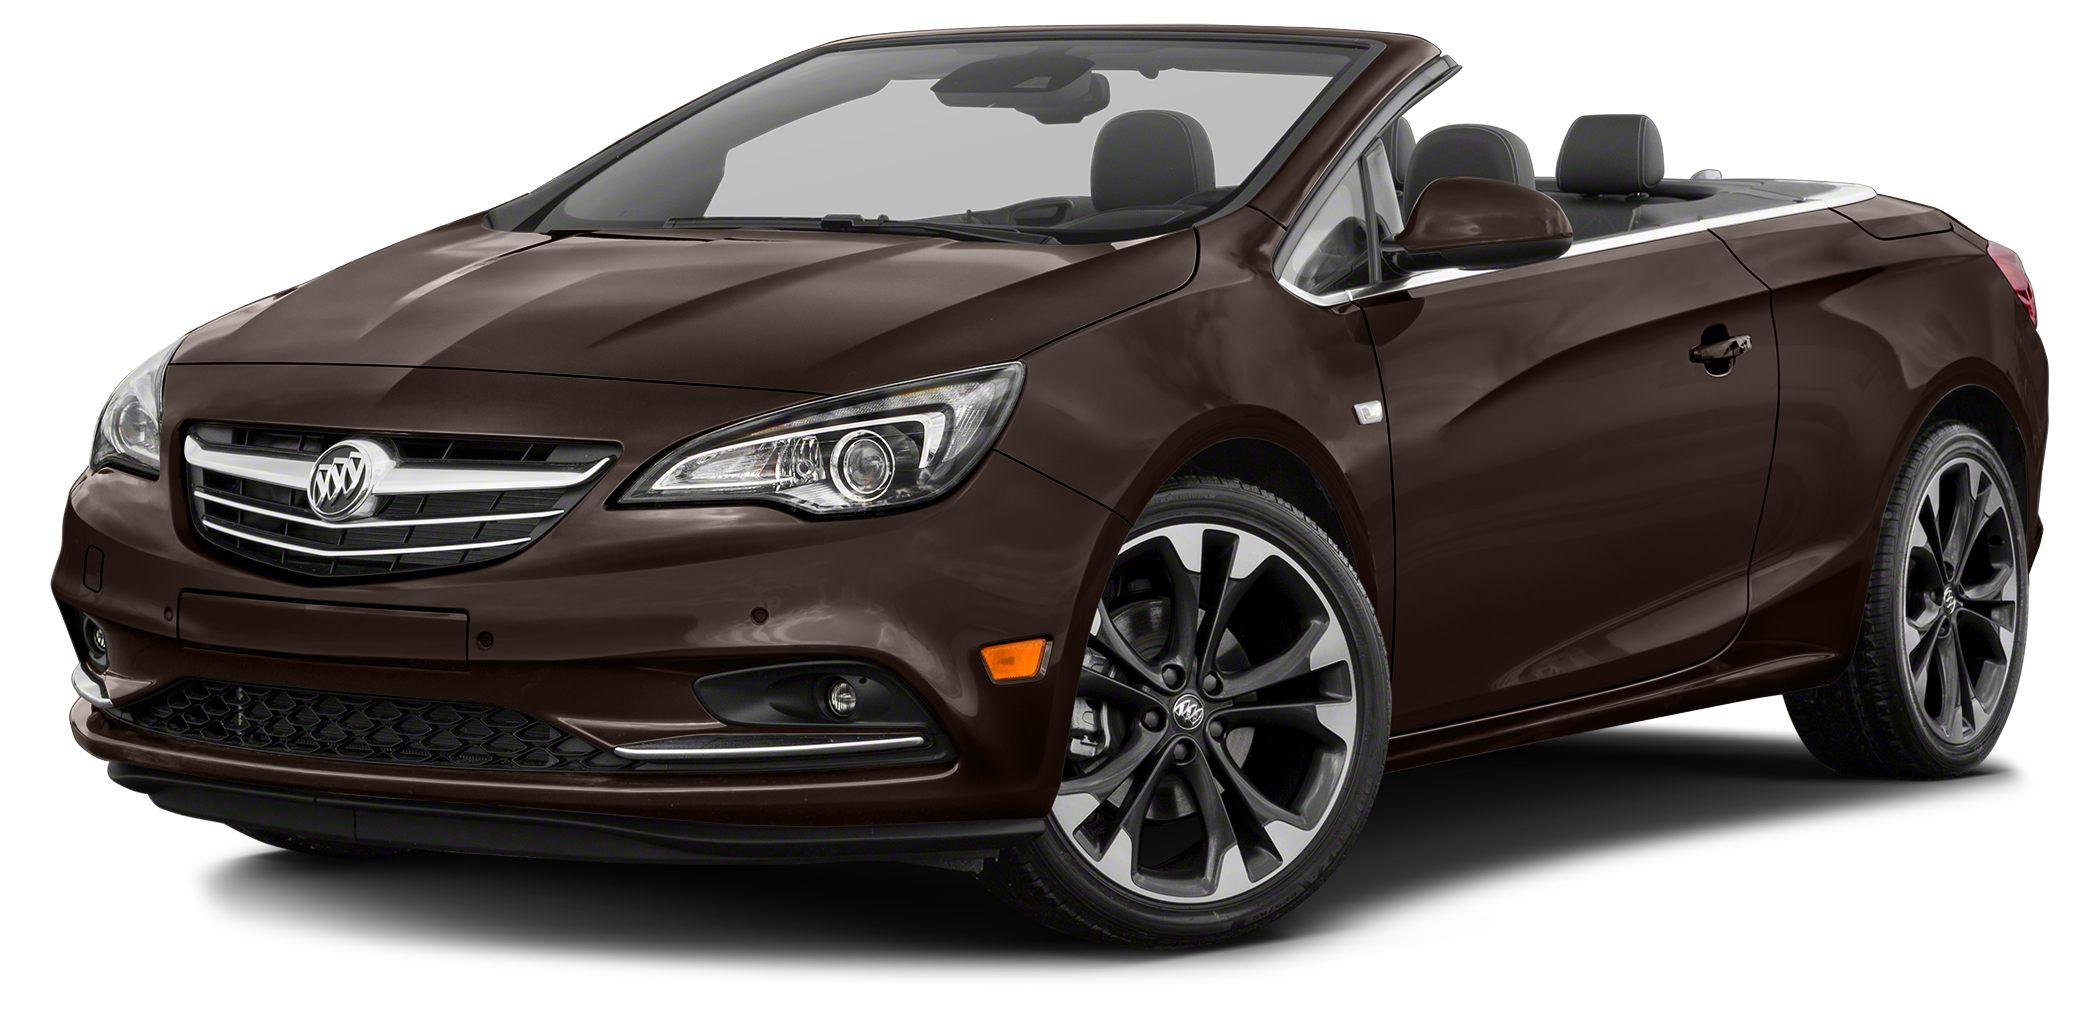 2017 Buick Cascada Premium Treat yourself to this 2017 Buick Cascada Premium which features a bac